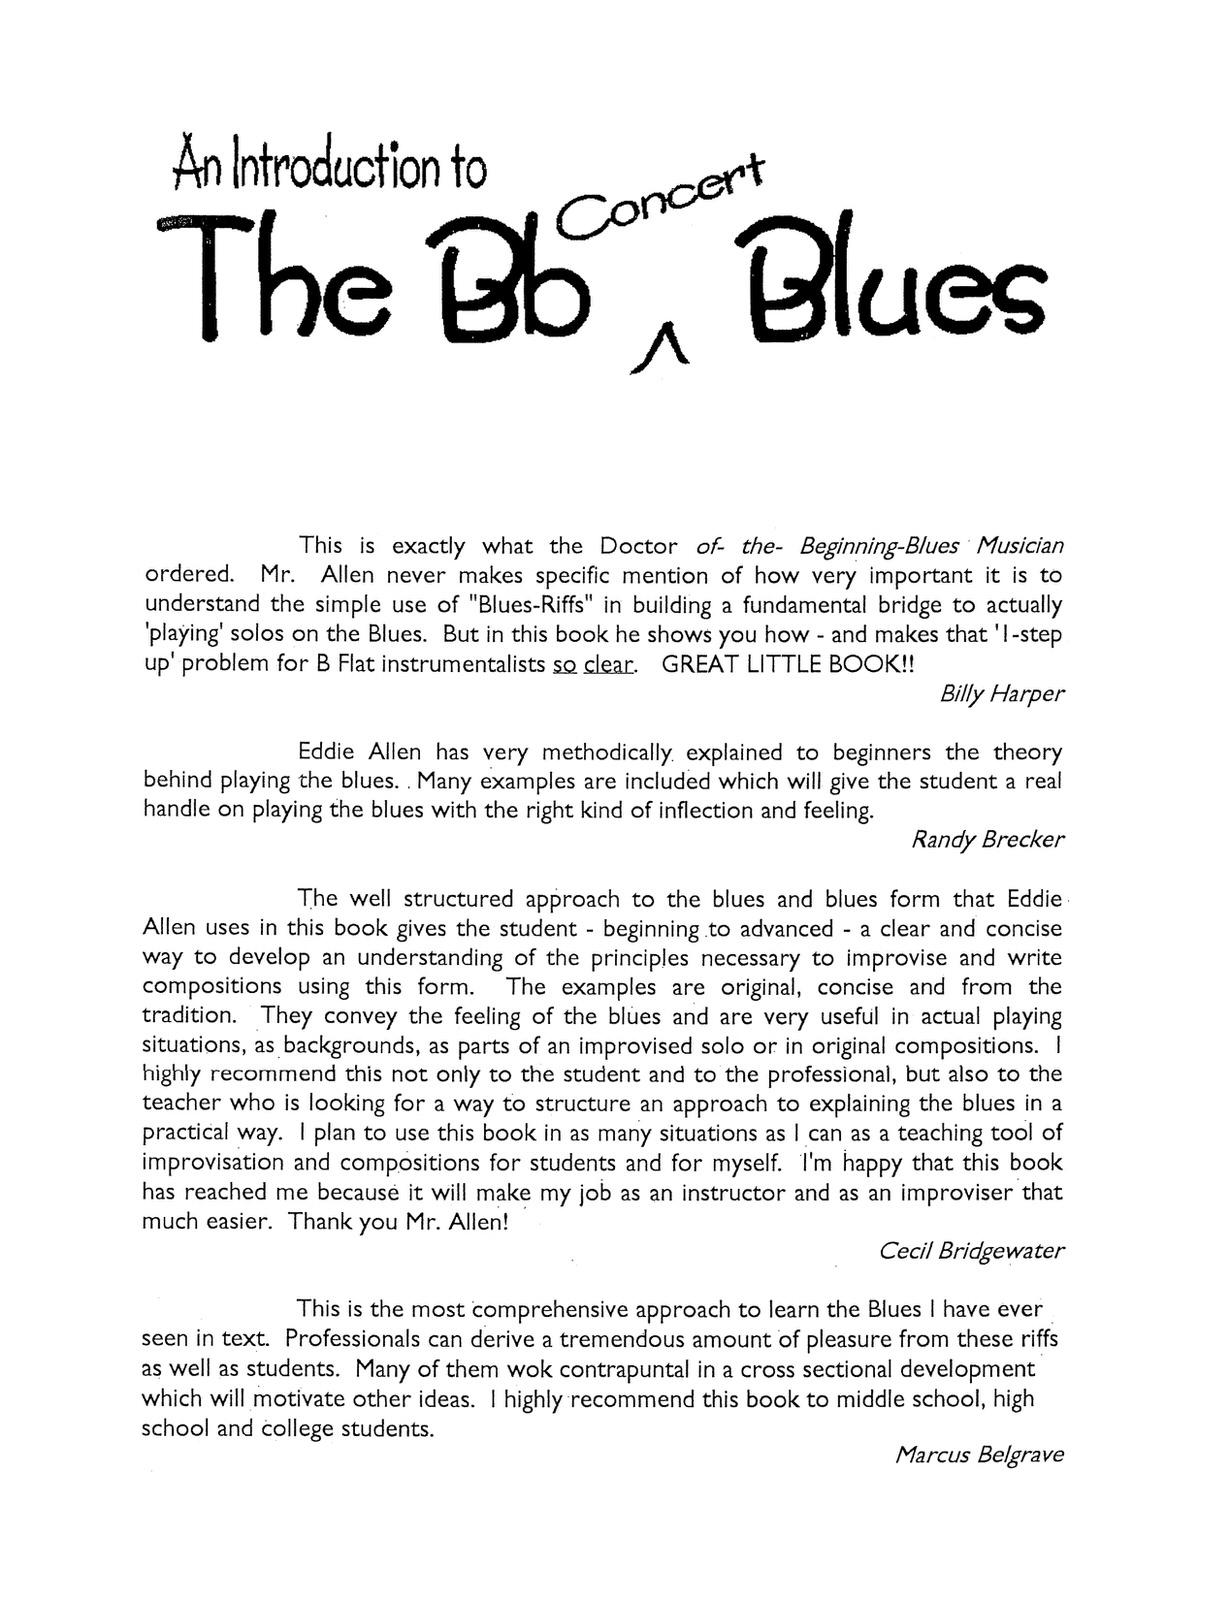 allen-intro-to-bb-concert-blues-2